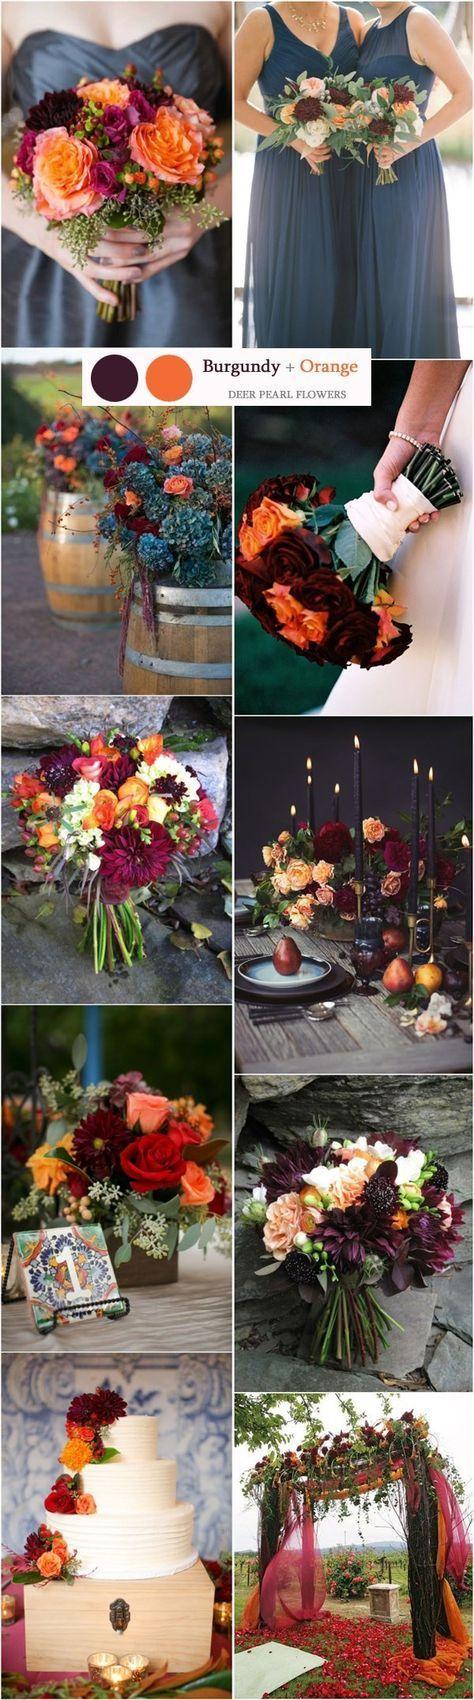 best wedding ideas images on pinterest wedding ideas wedding